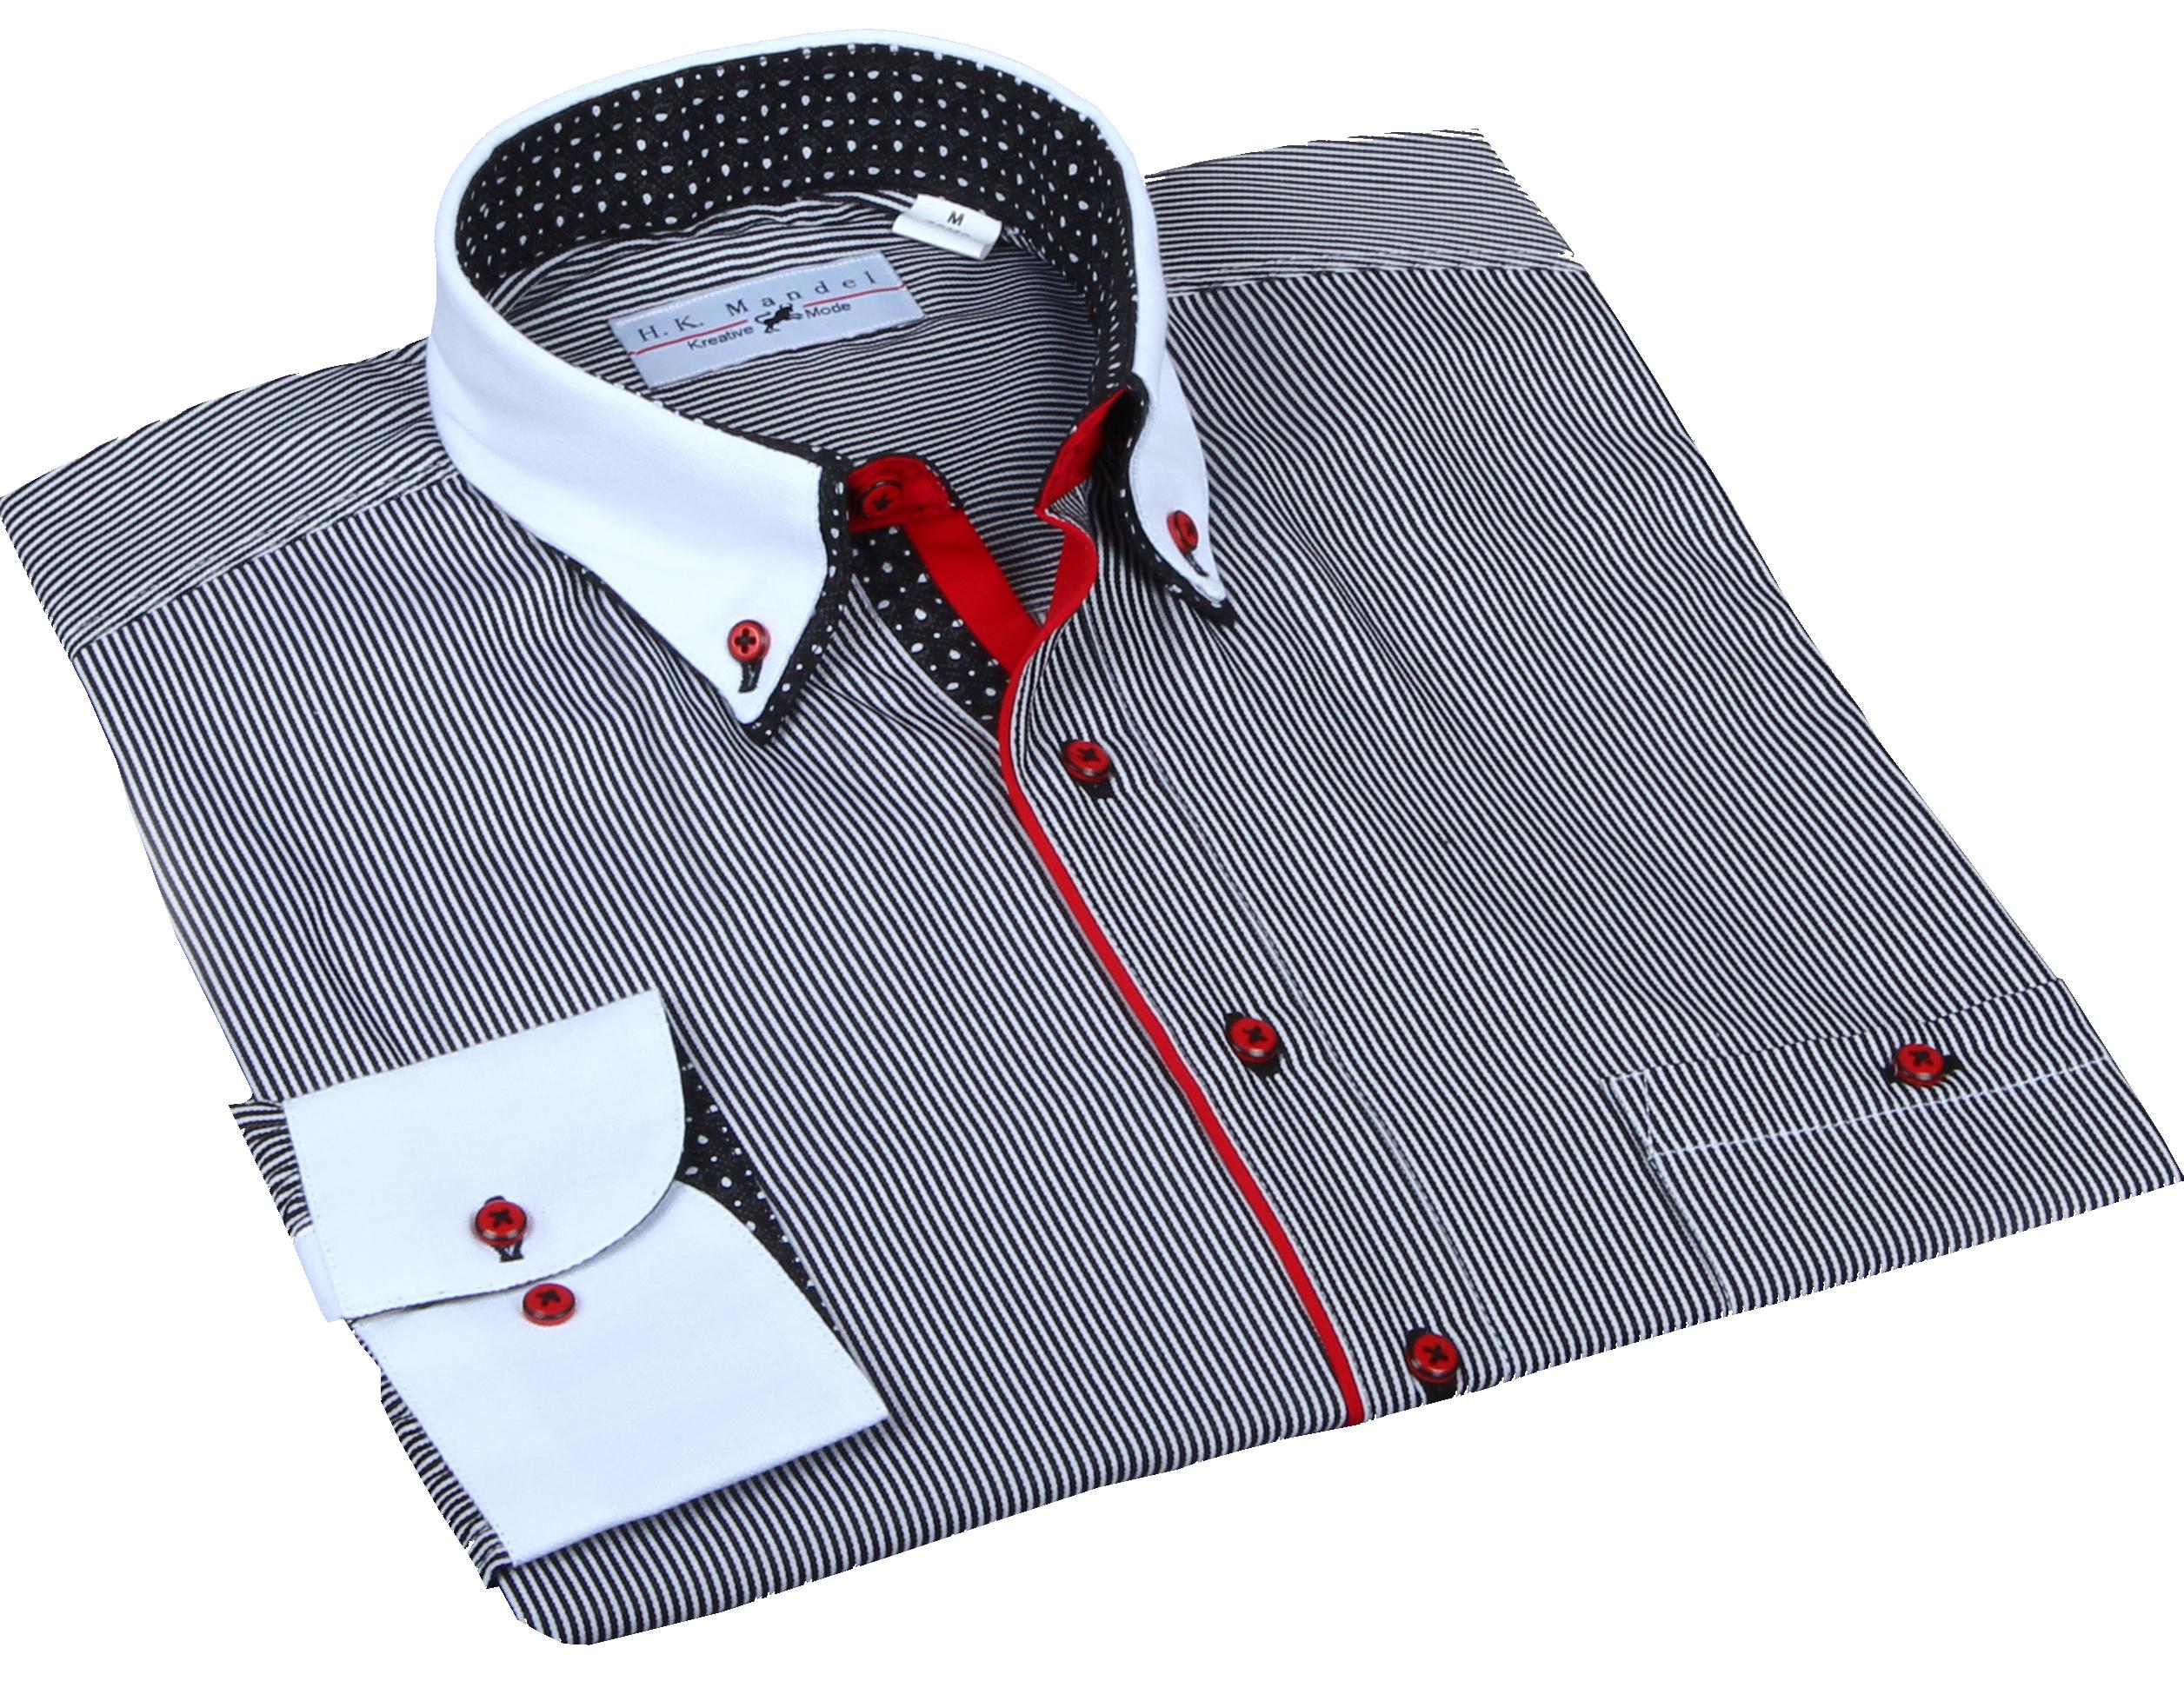 2ee68b3026c6 H.K. Mandel Kreative Mode für Männer - doppelkragen hemd ...